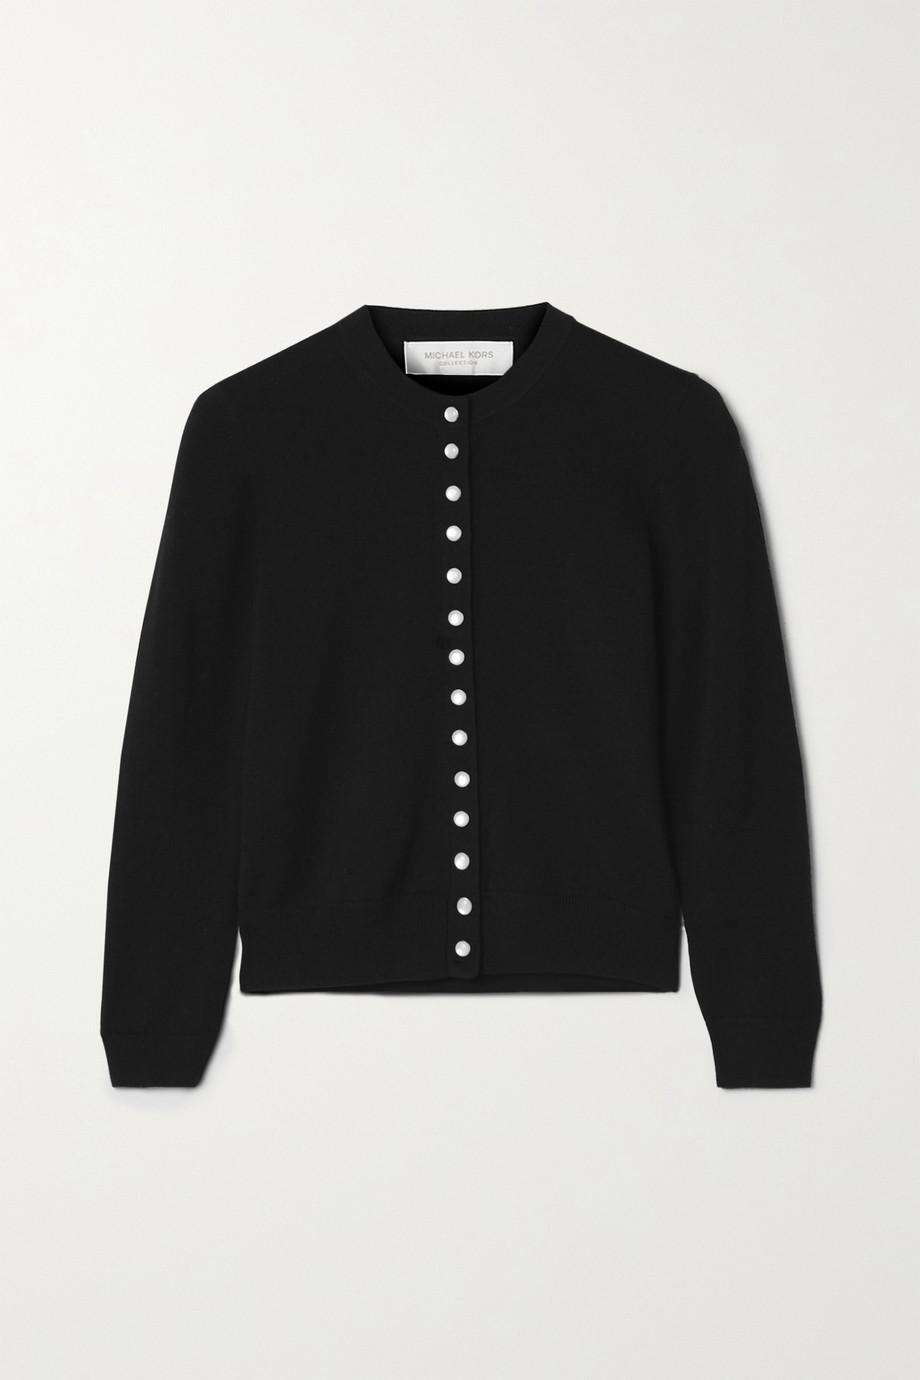 Michael Kors Collection Merino wool cardigan